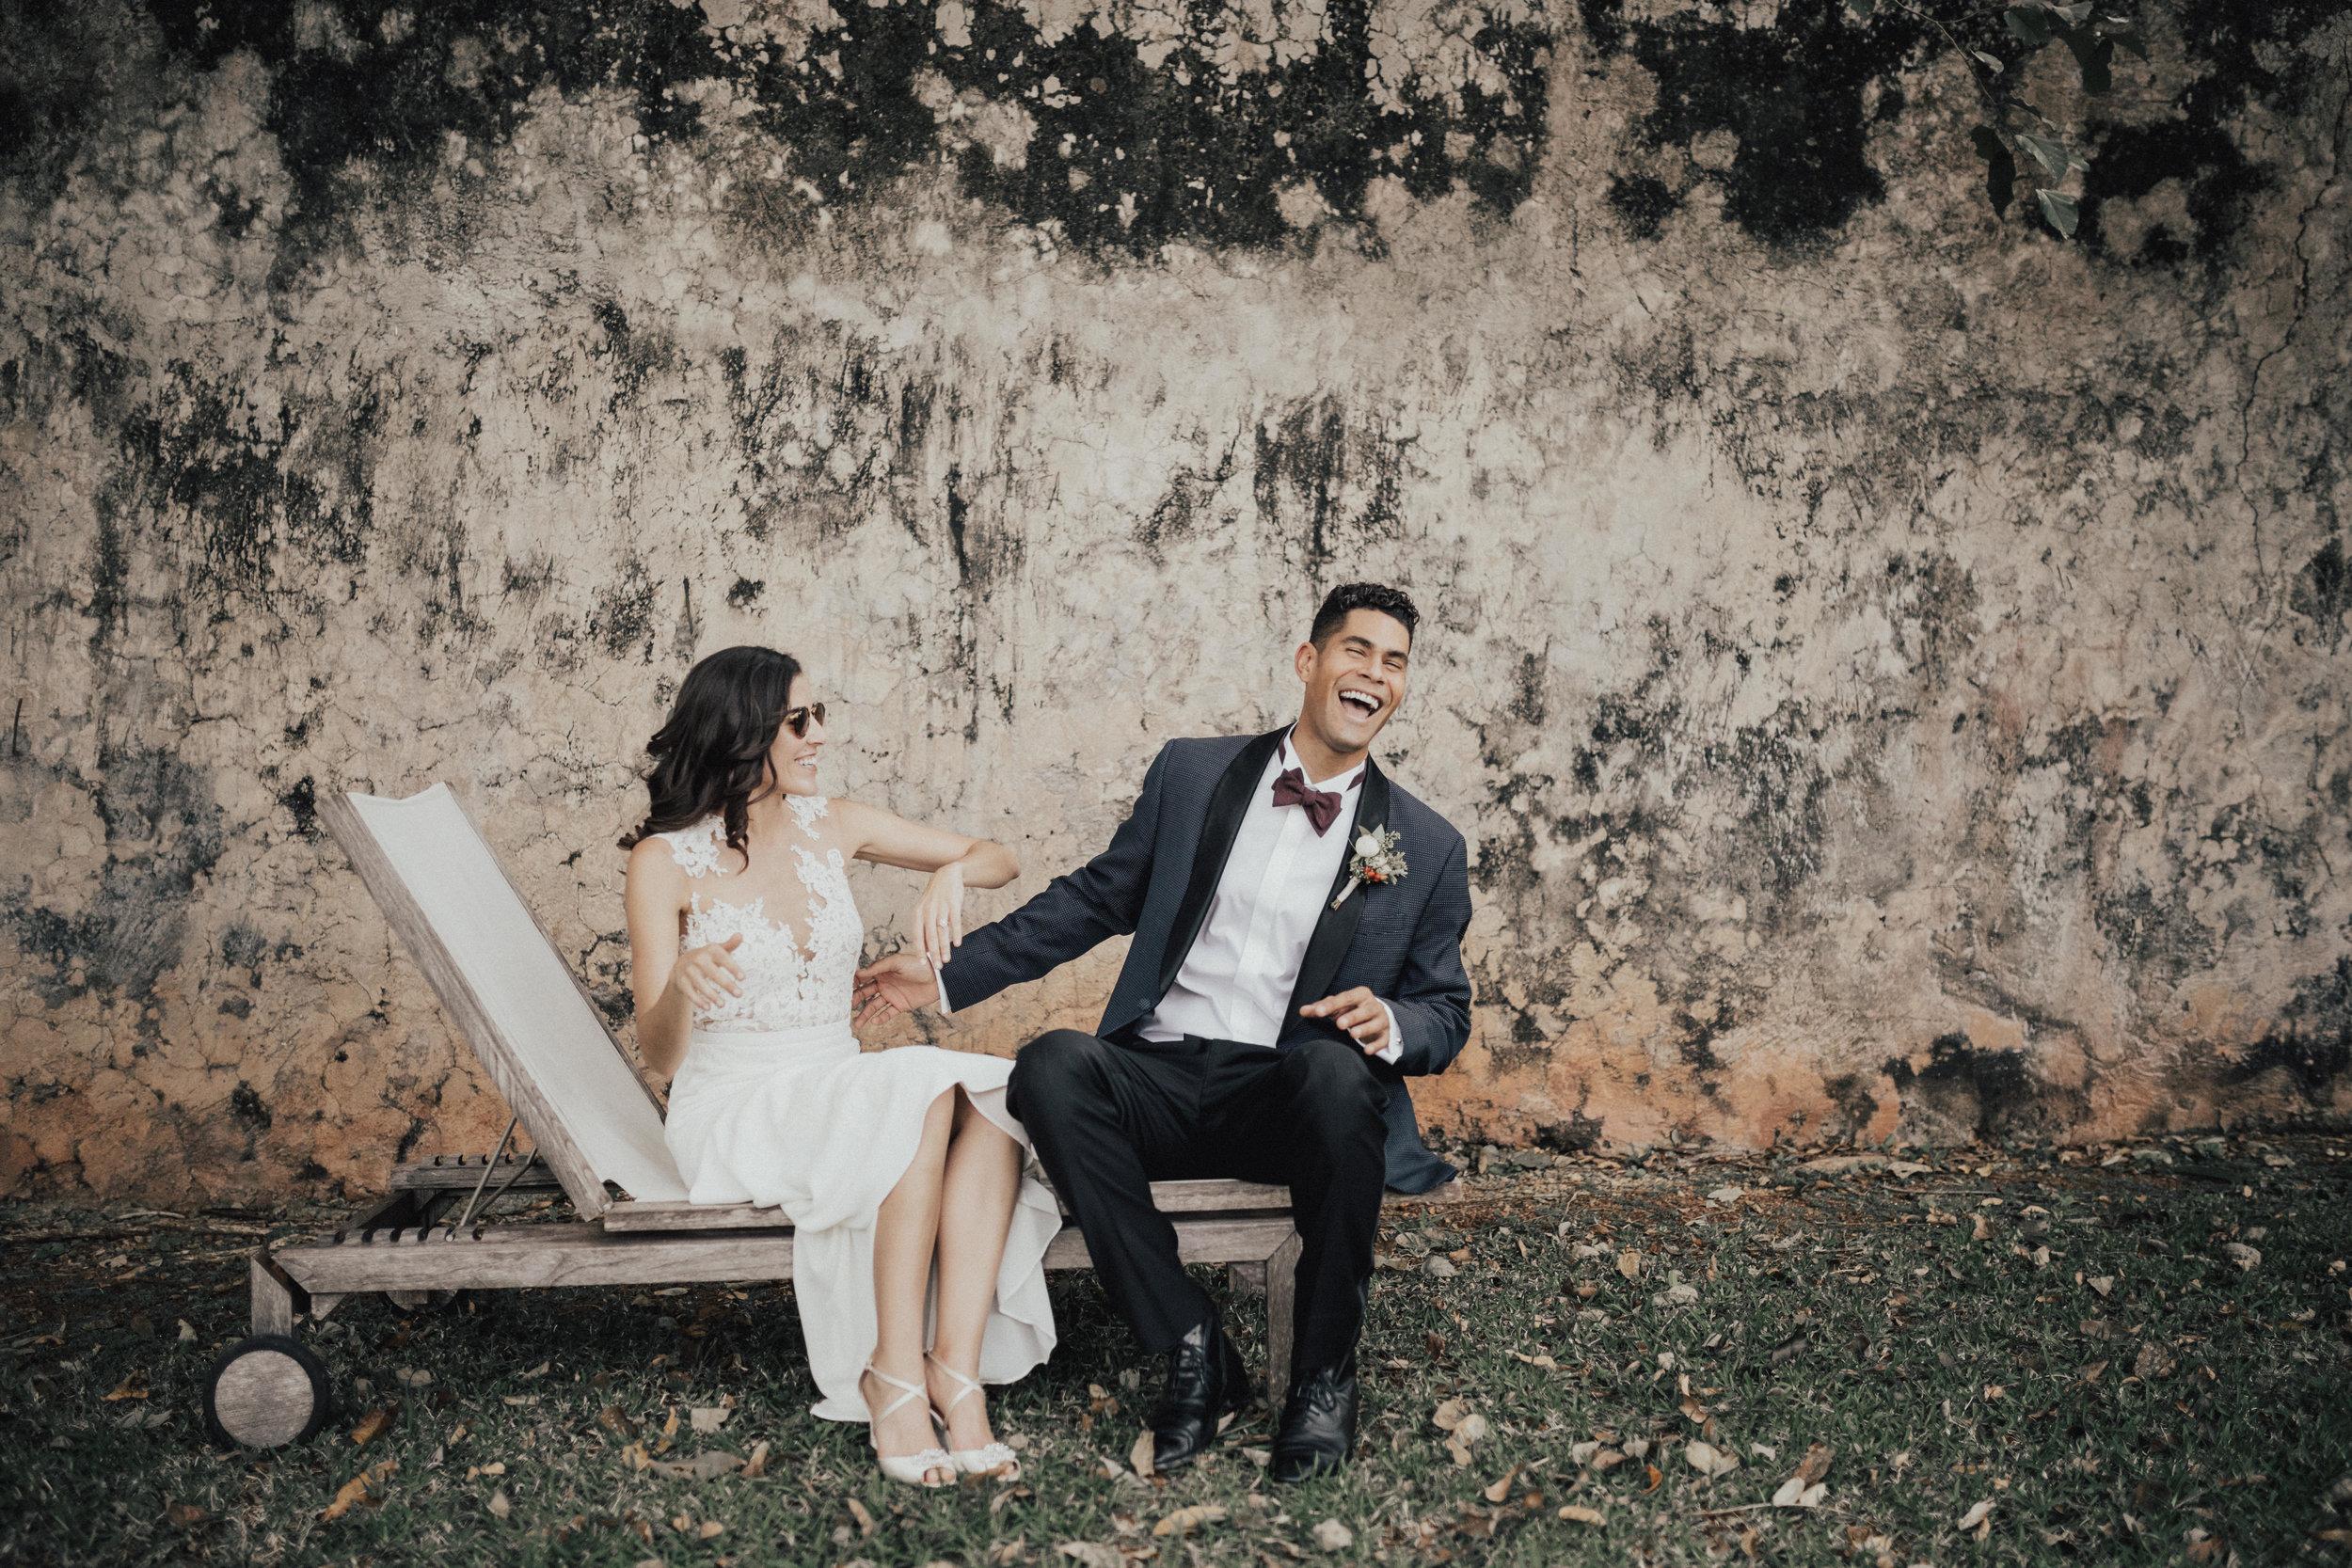 2 first look Tina Kai Merida Mexico Wedding  (82 of 120).jpg